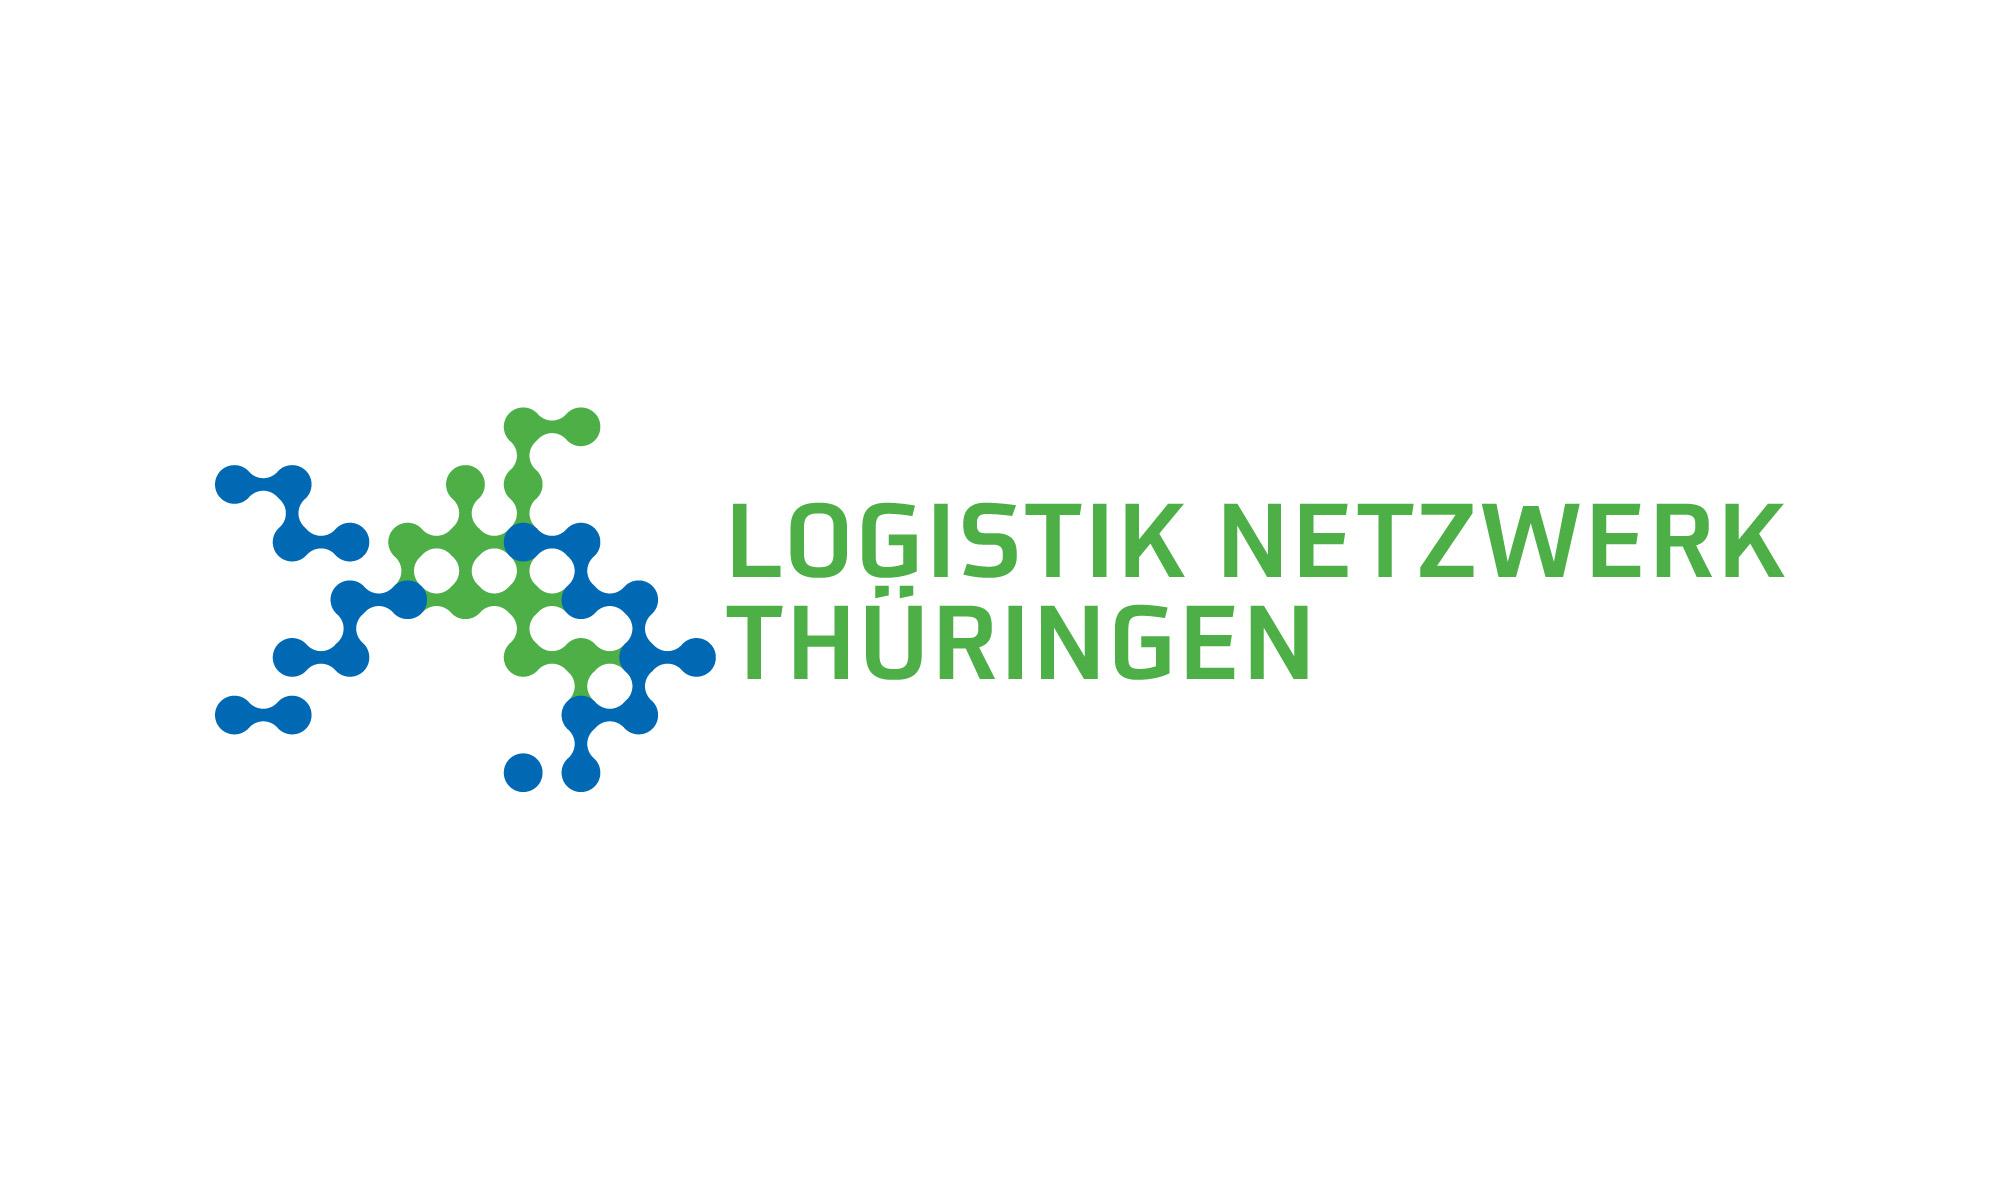 Logistik Netzwerk Thüringen Kooperation